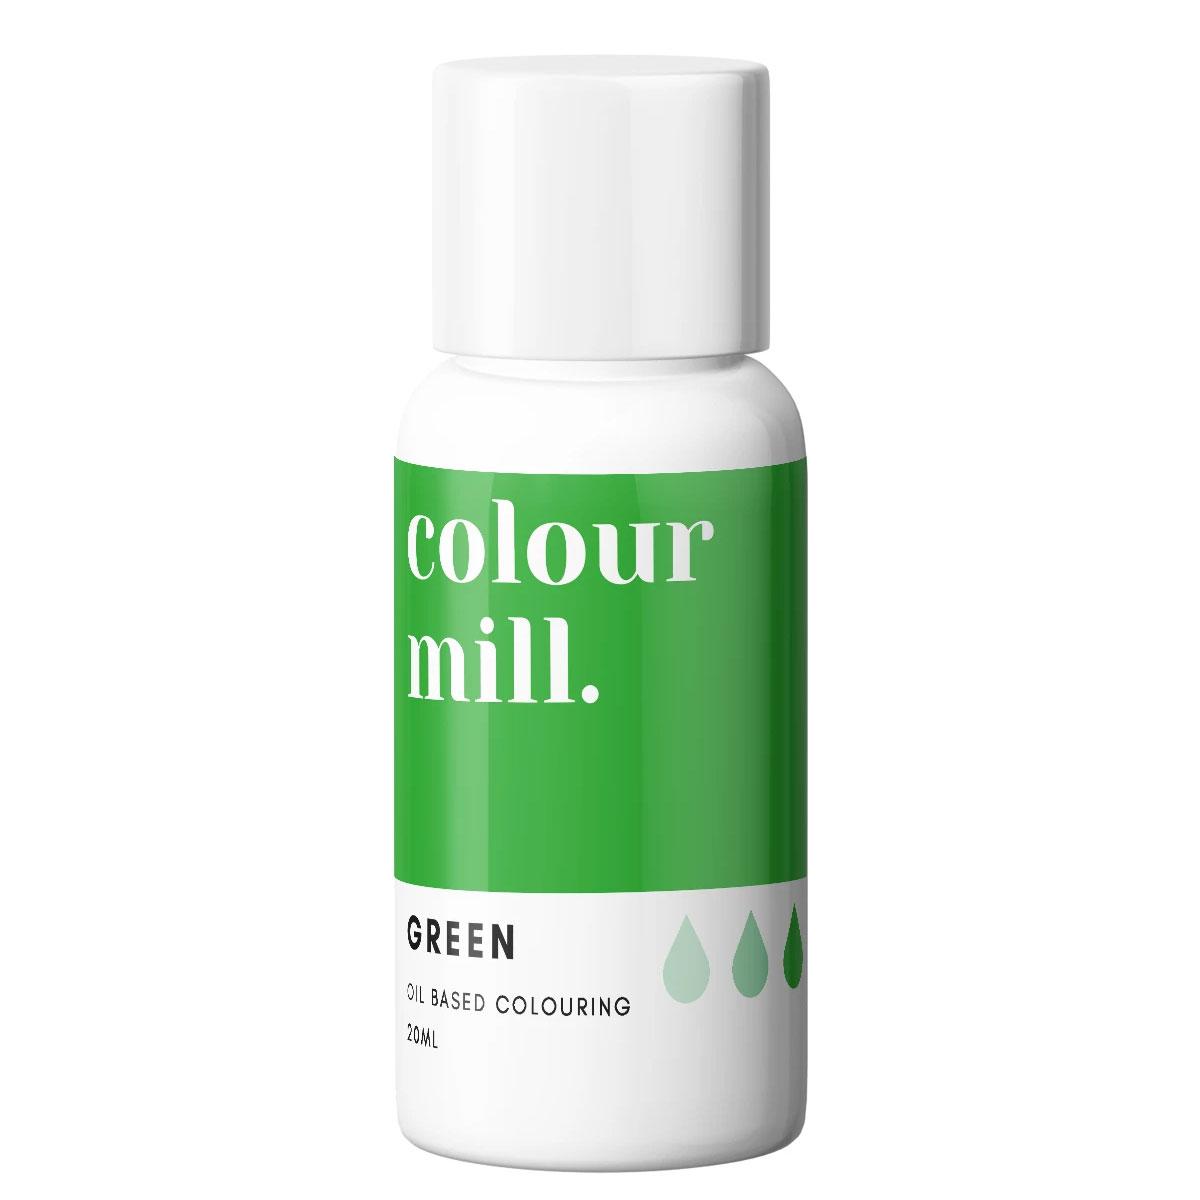 Colour Mill fettlösliche Lebensmittelfarbe - Green 20ml